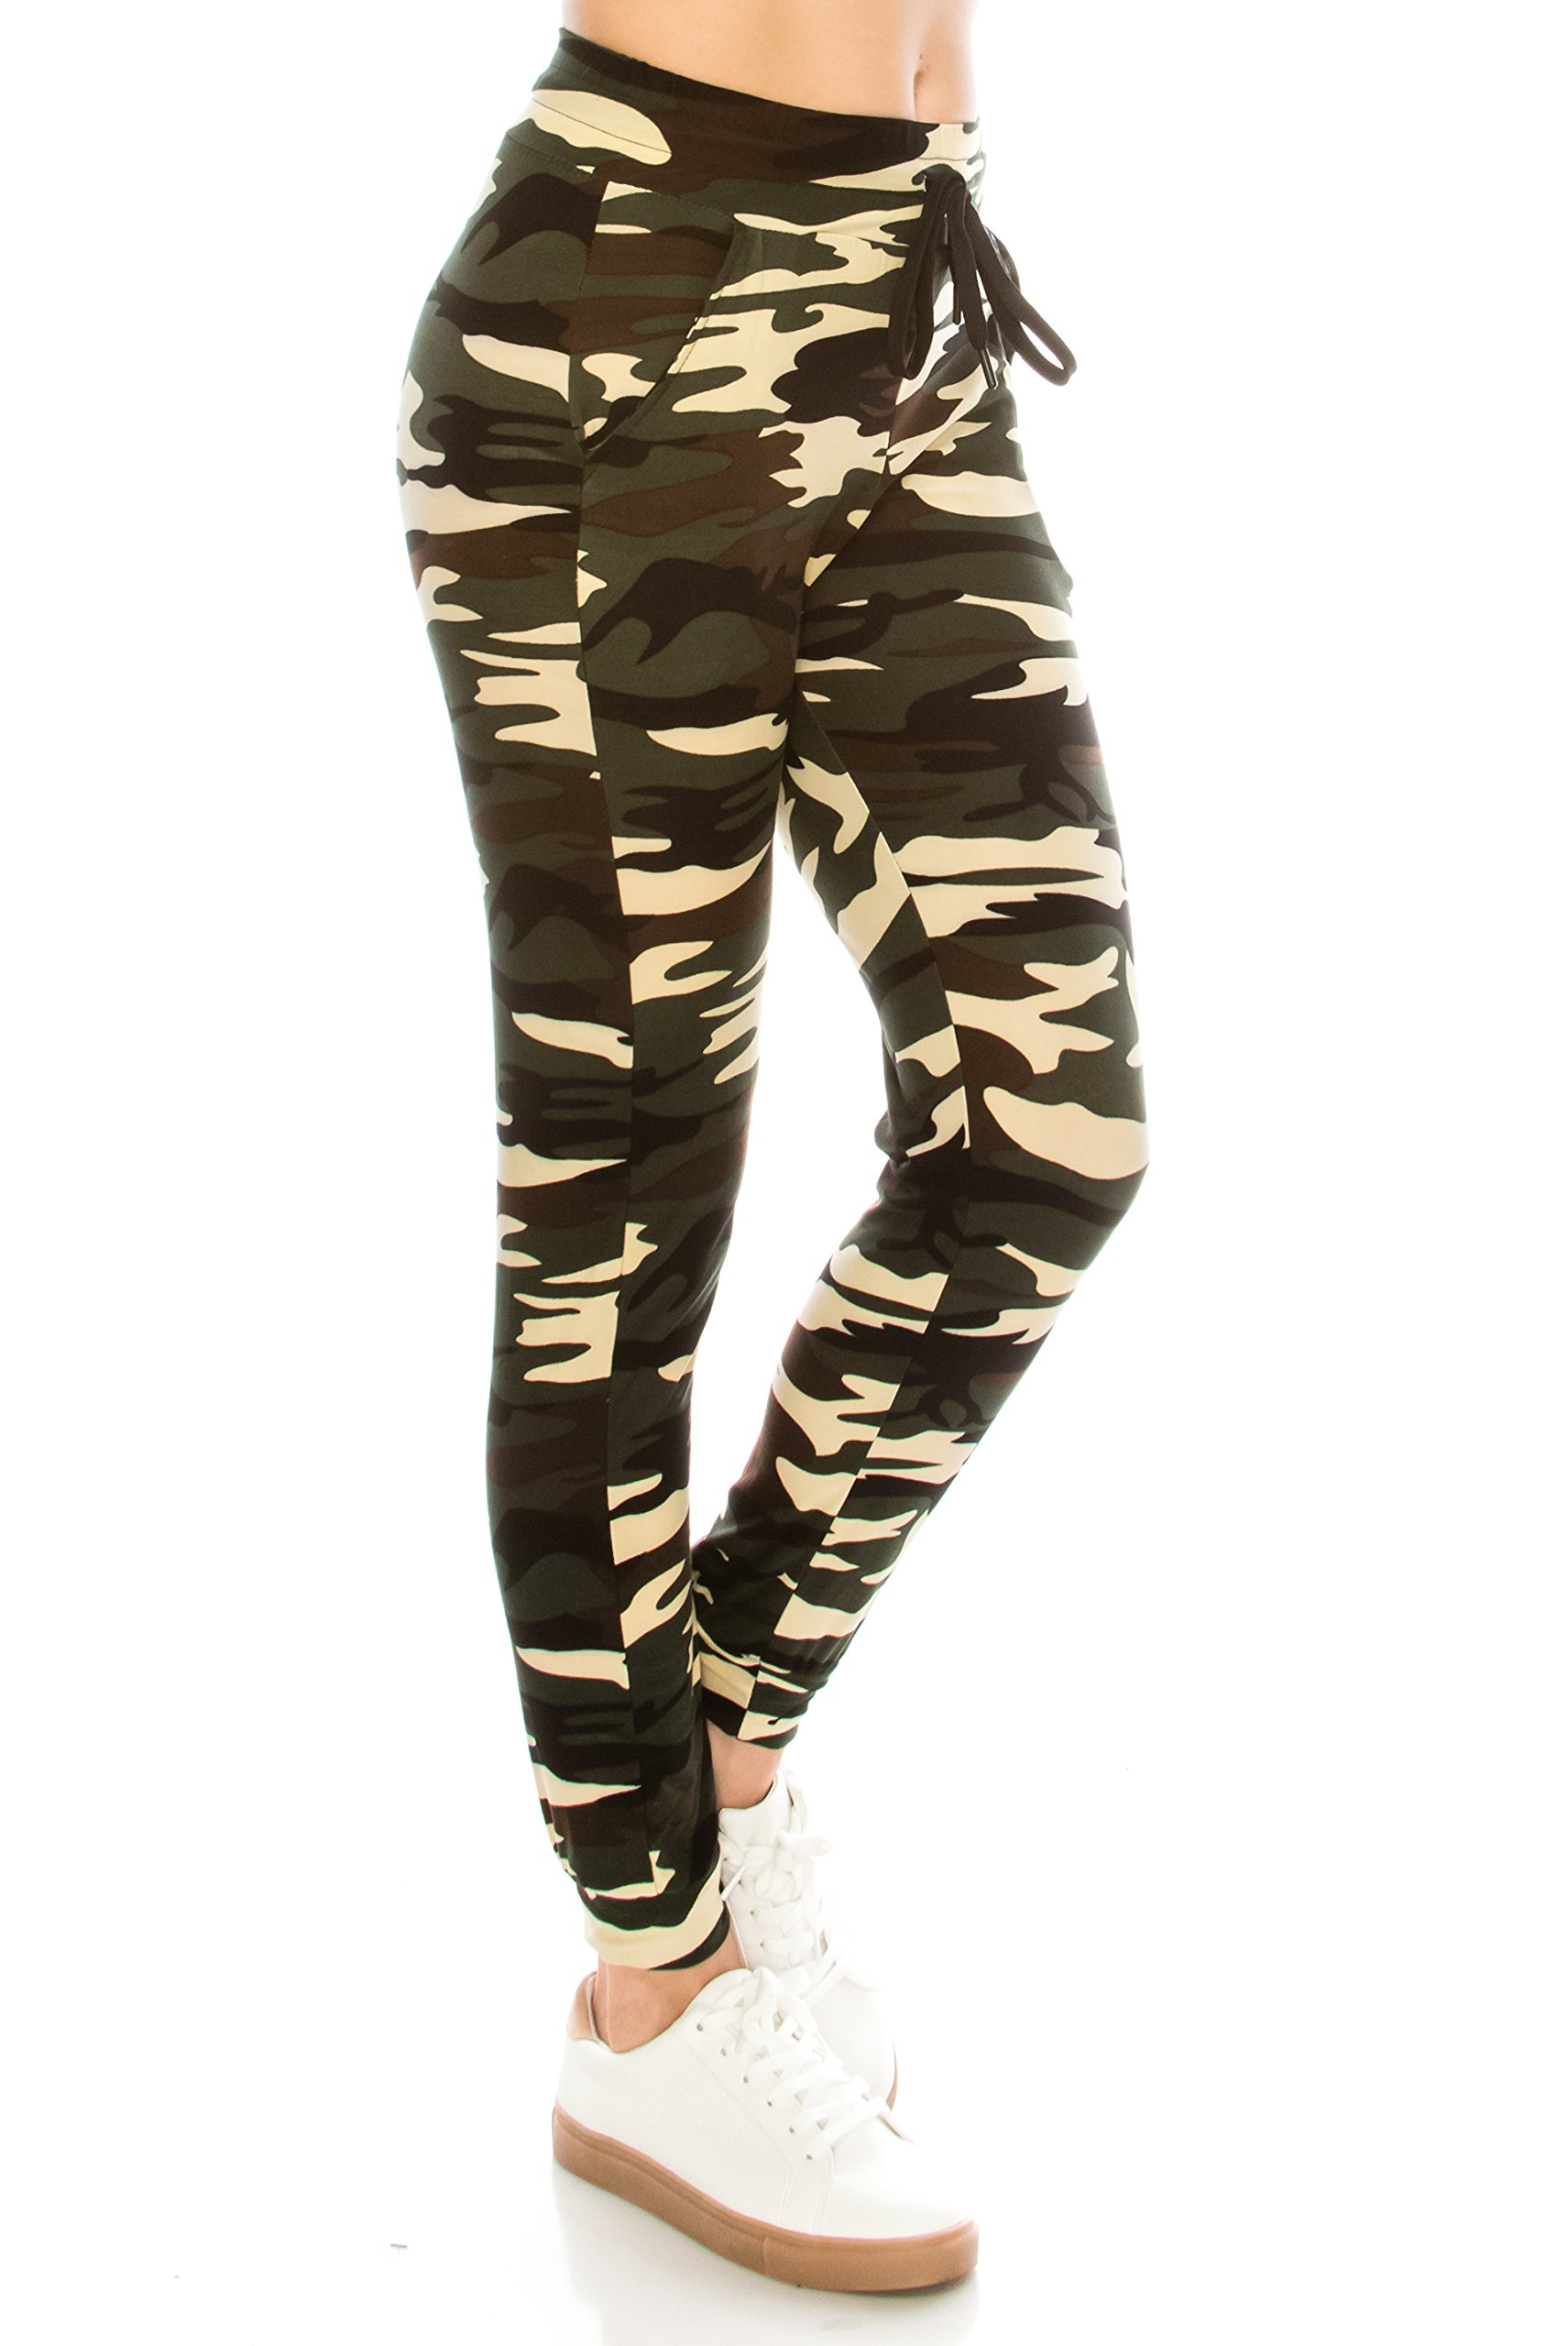 ALWAYS Women Drawstrings Jogger Sweatpants - Skinny Camo Soft Pockets Pants S/M by ALWAYS